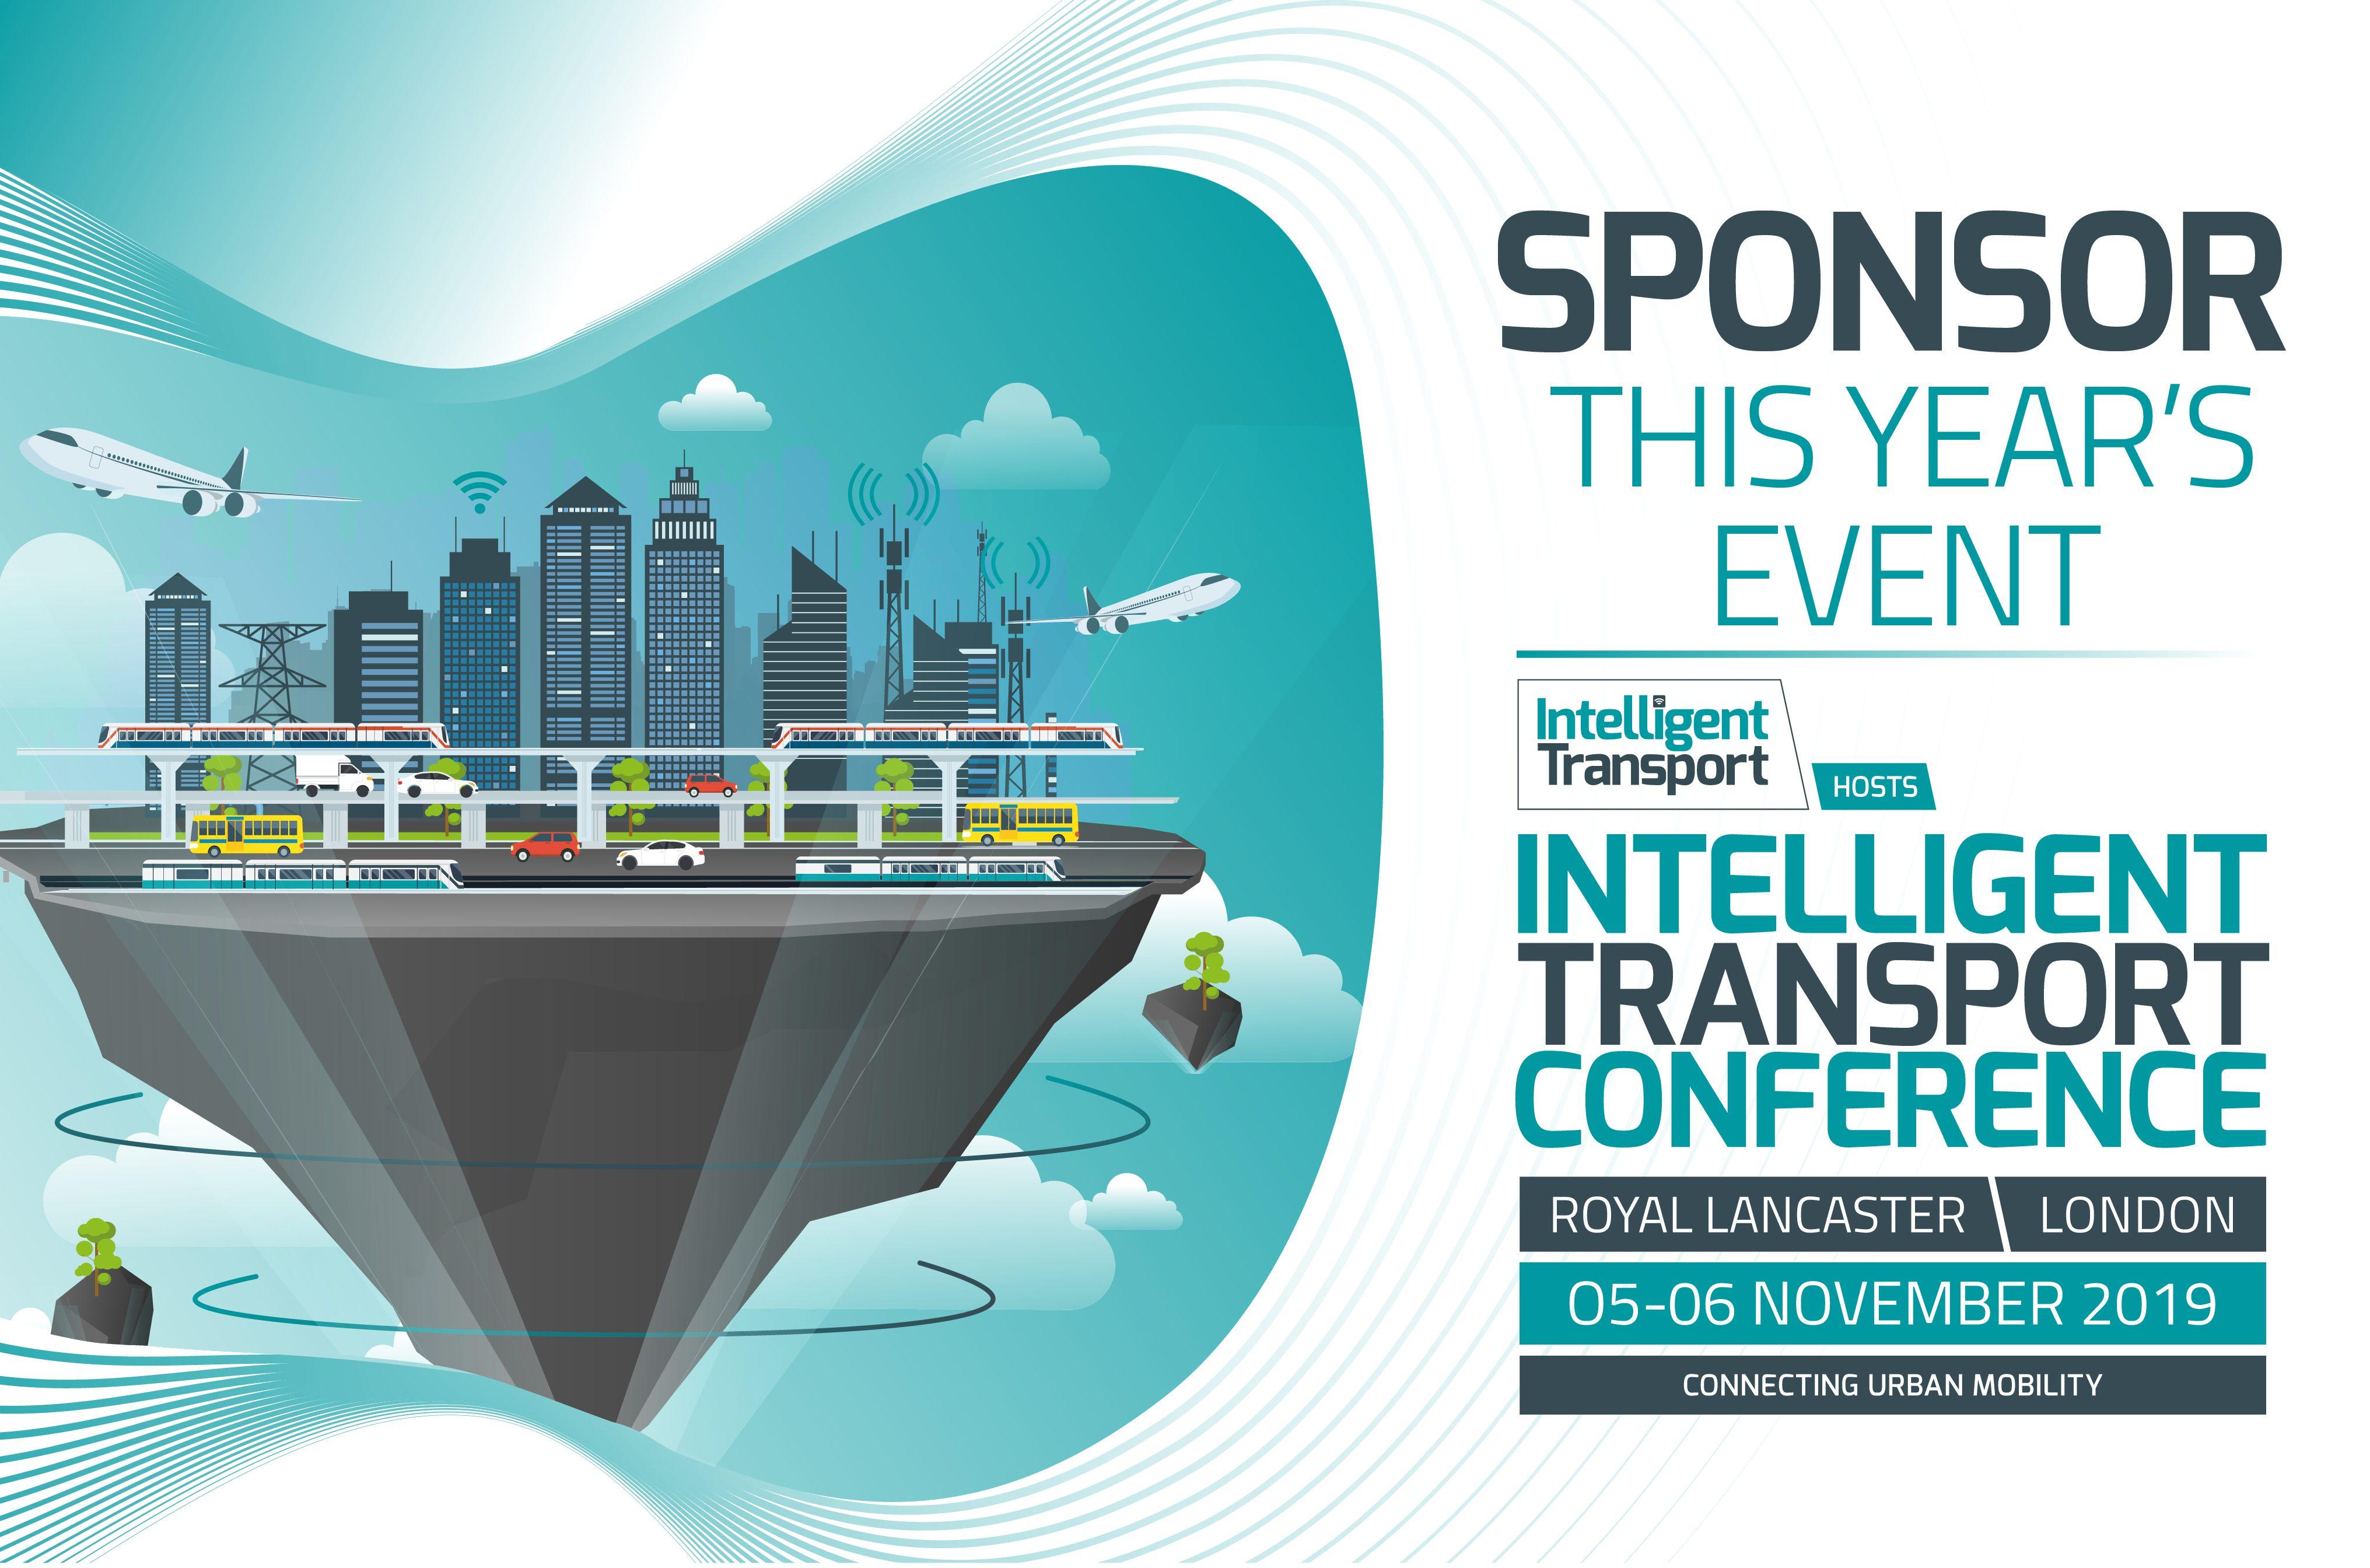 Intelligent Transport Conference 2019 - Intelligent Transport